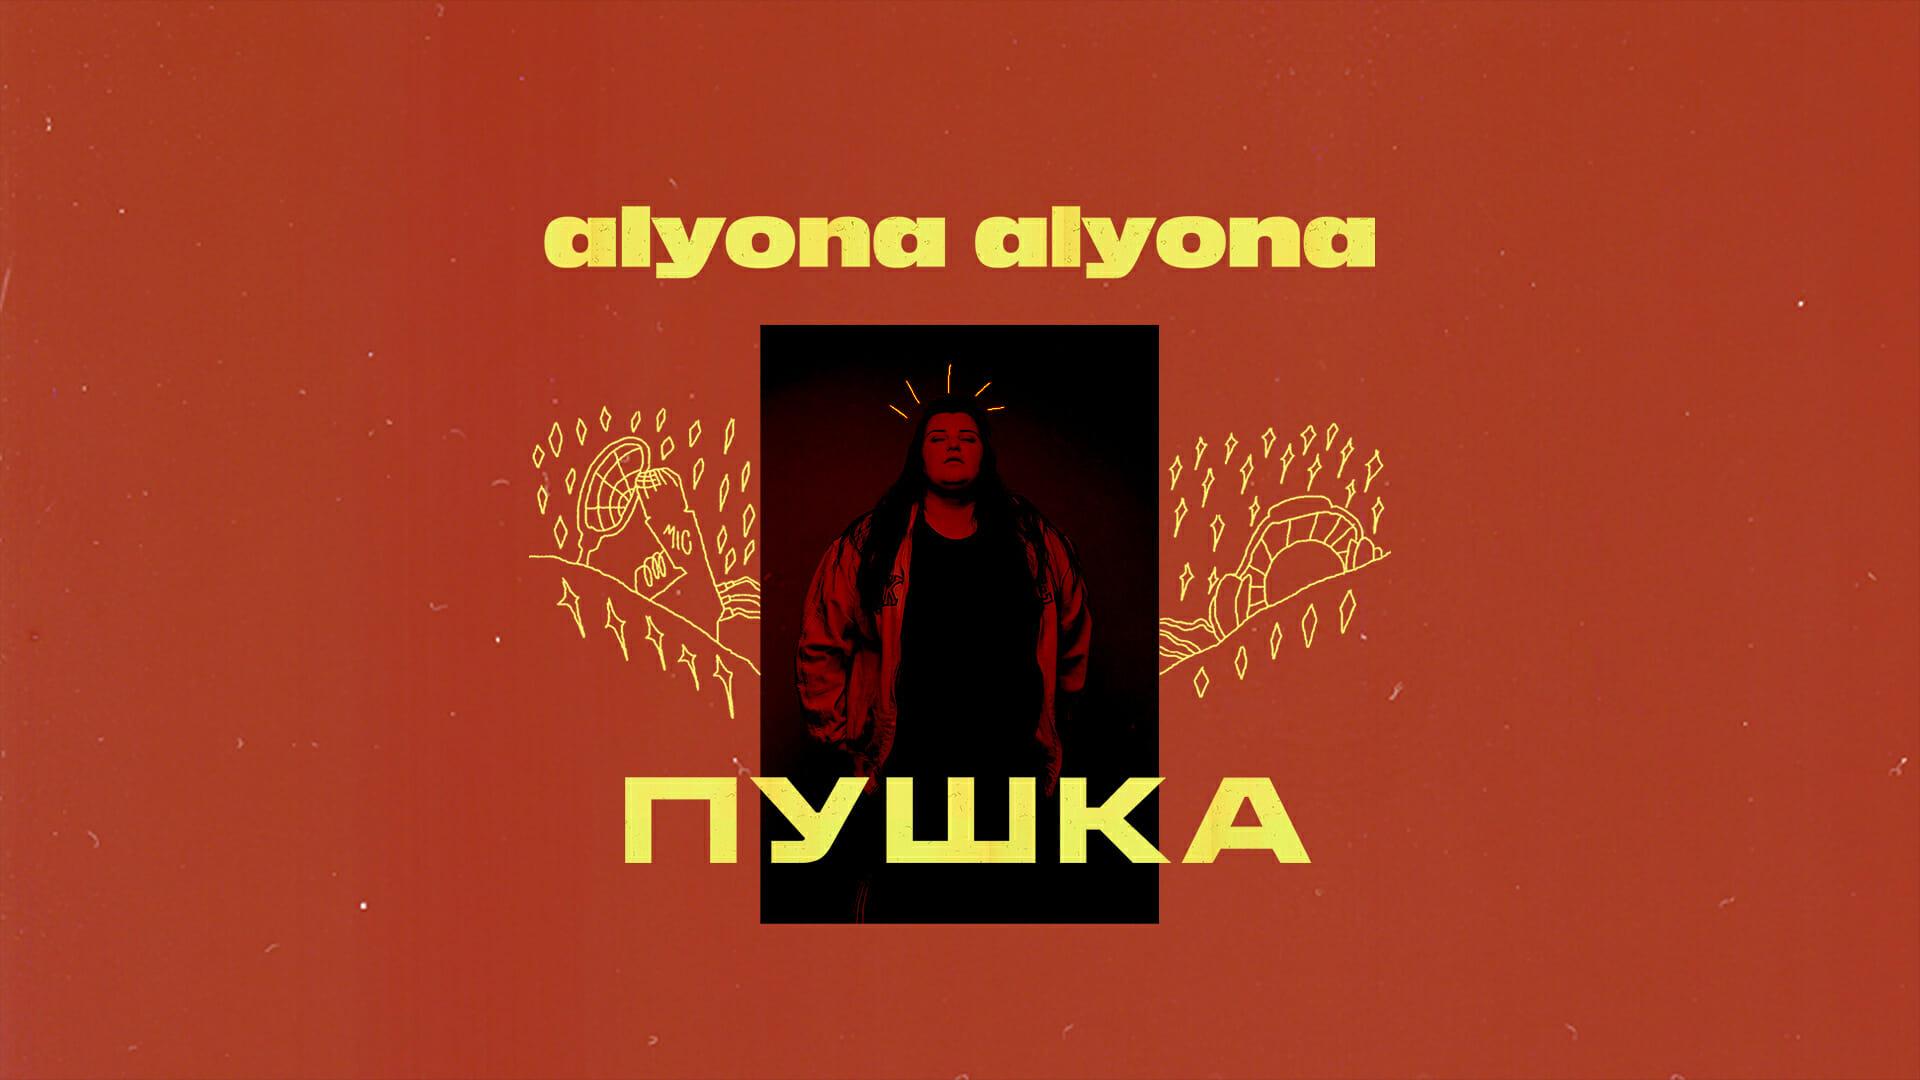 Alyona Alyona Wins Album of the Year